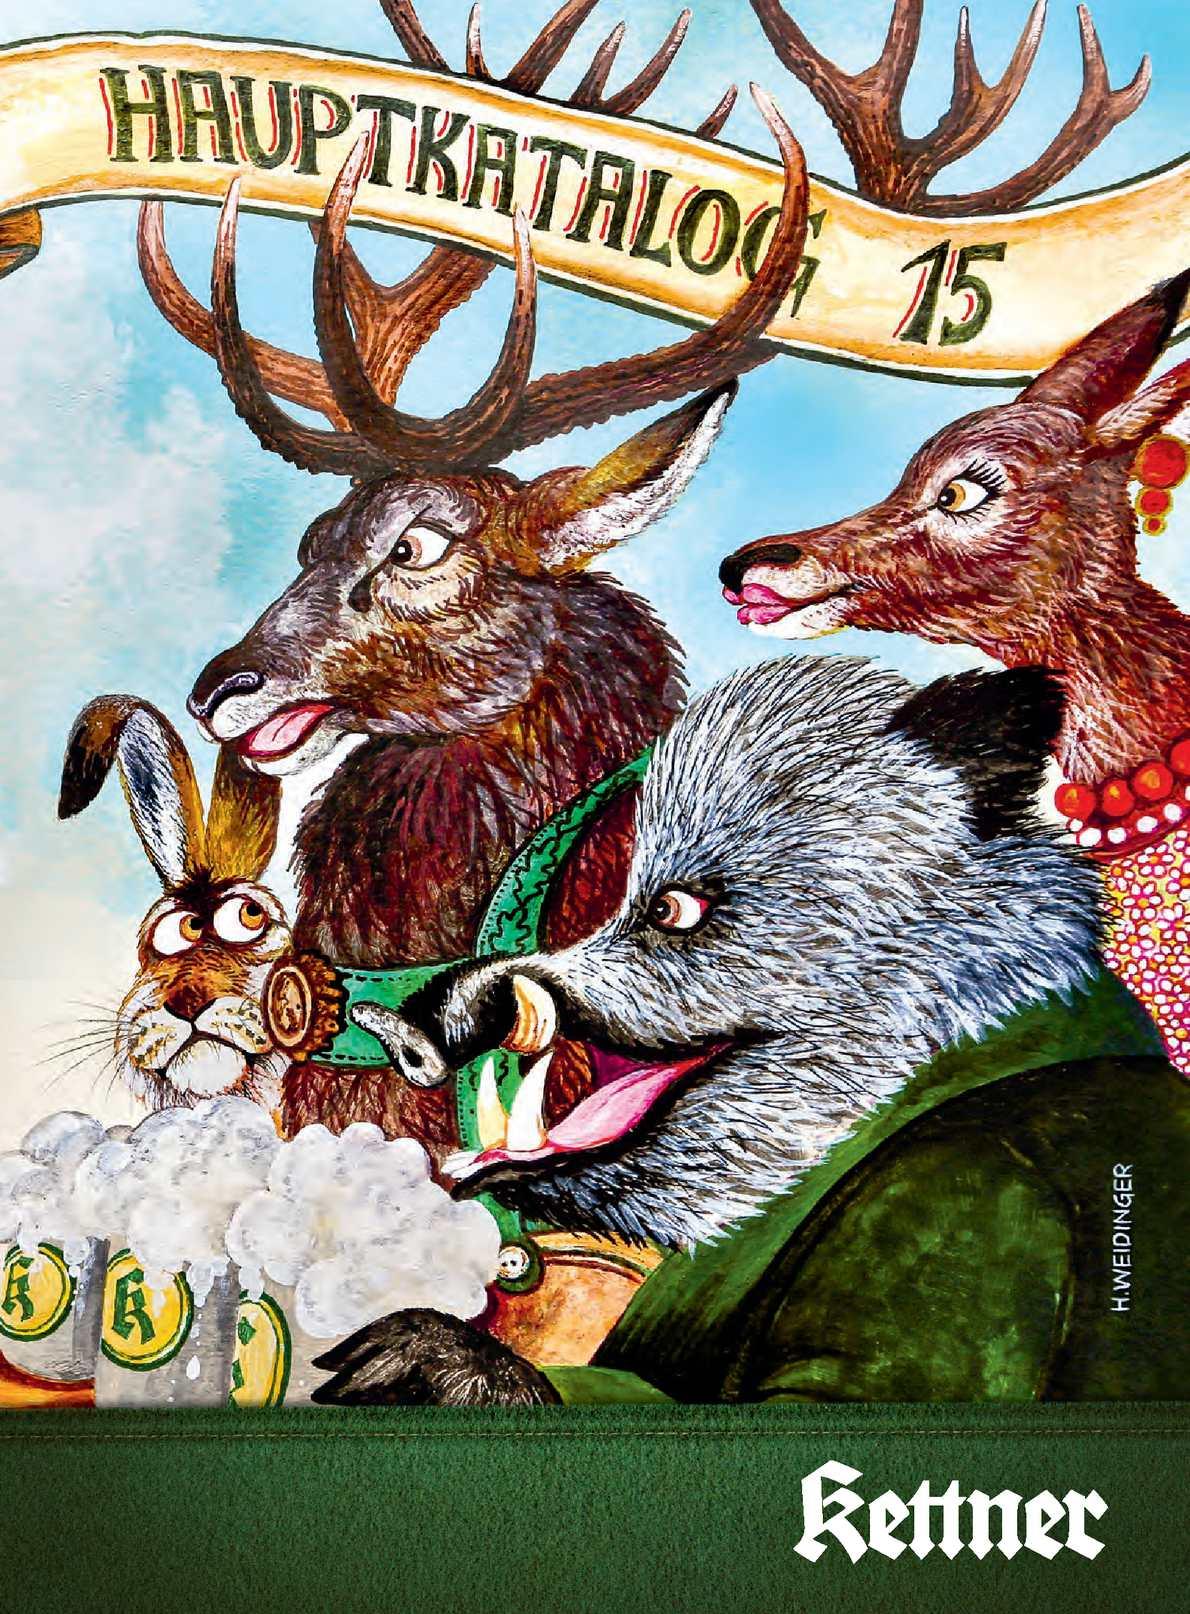 calam�o kettner hauptkatalog 2015  Gnstig Fynchhatton 848 Walnut Pullover Herren Auf Verkauf P 1265 #1